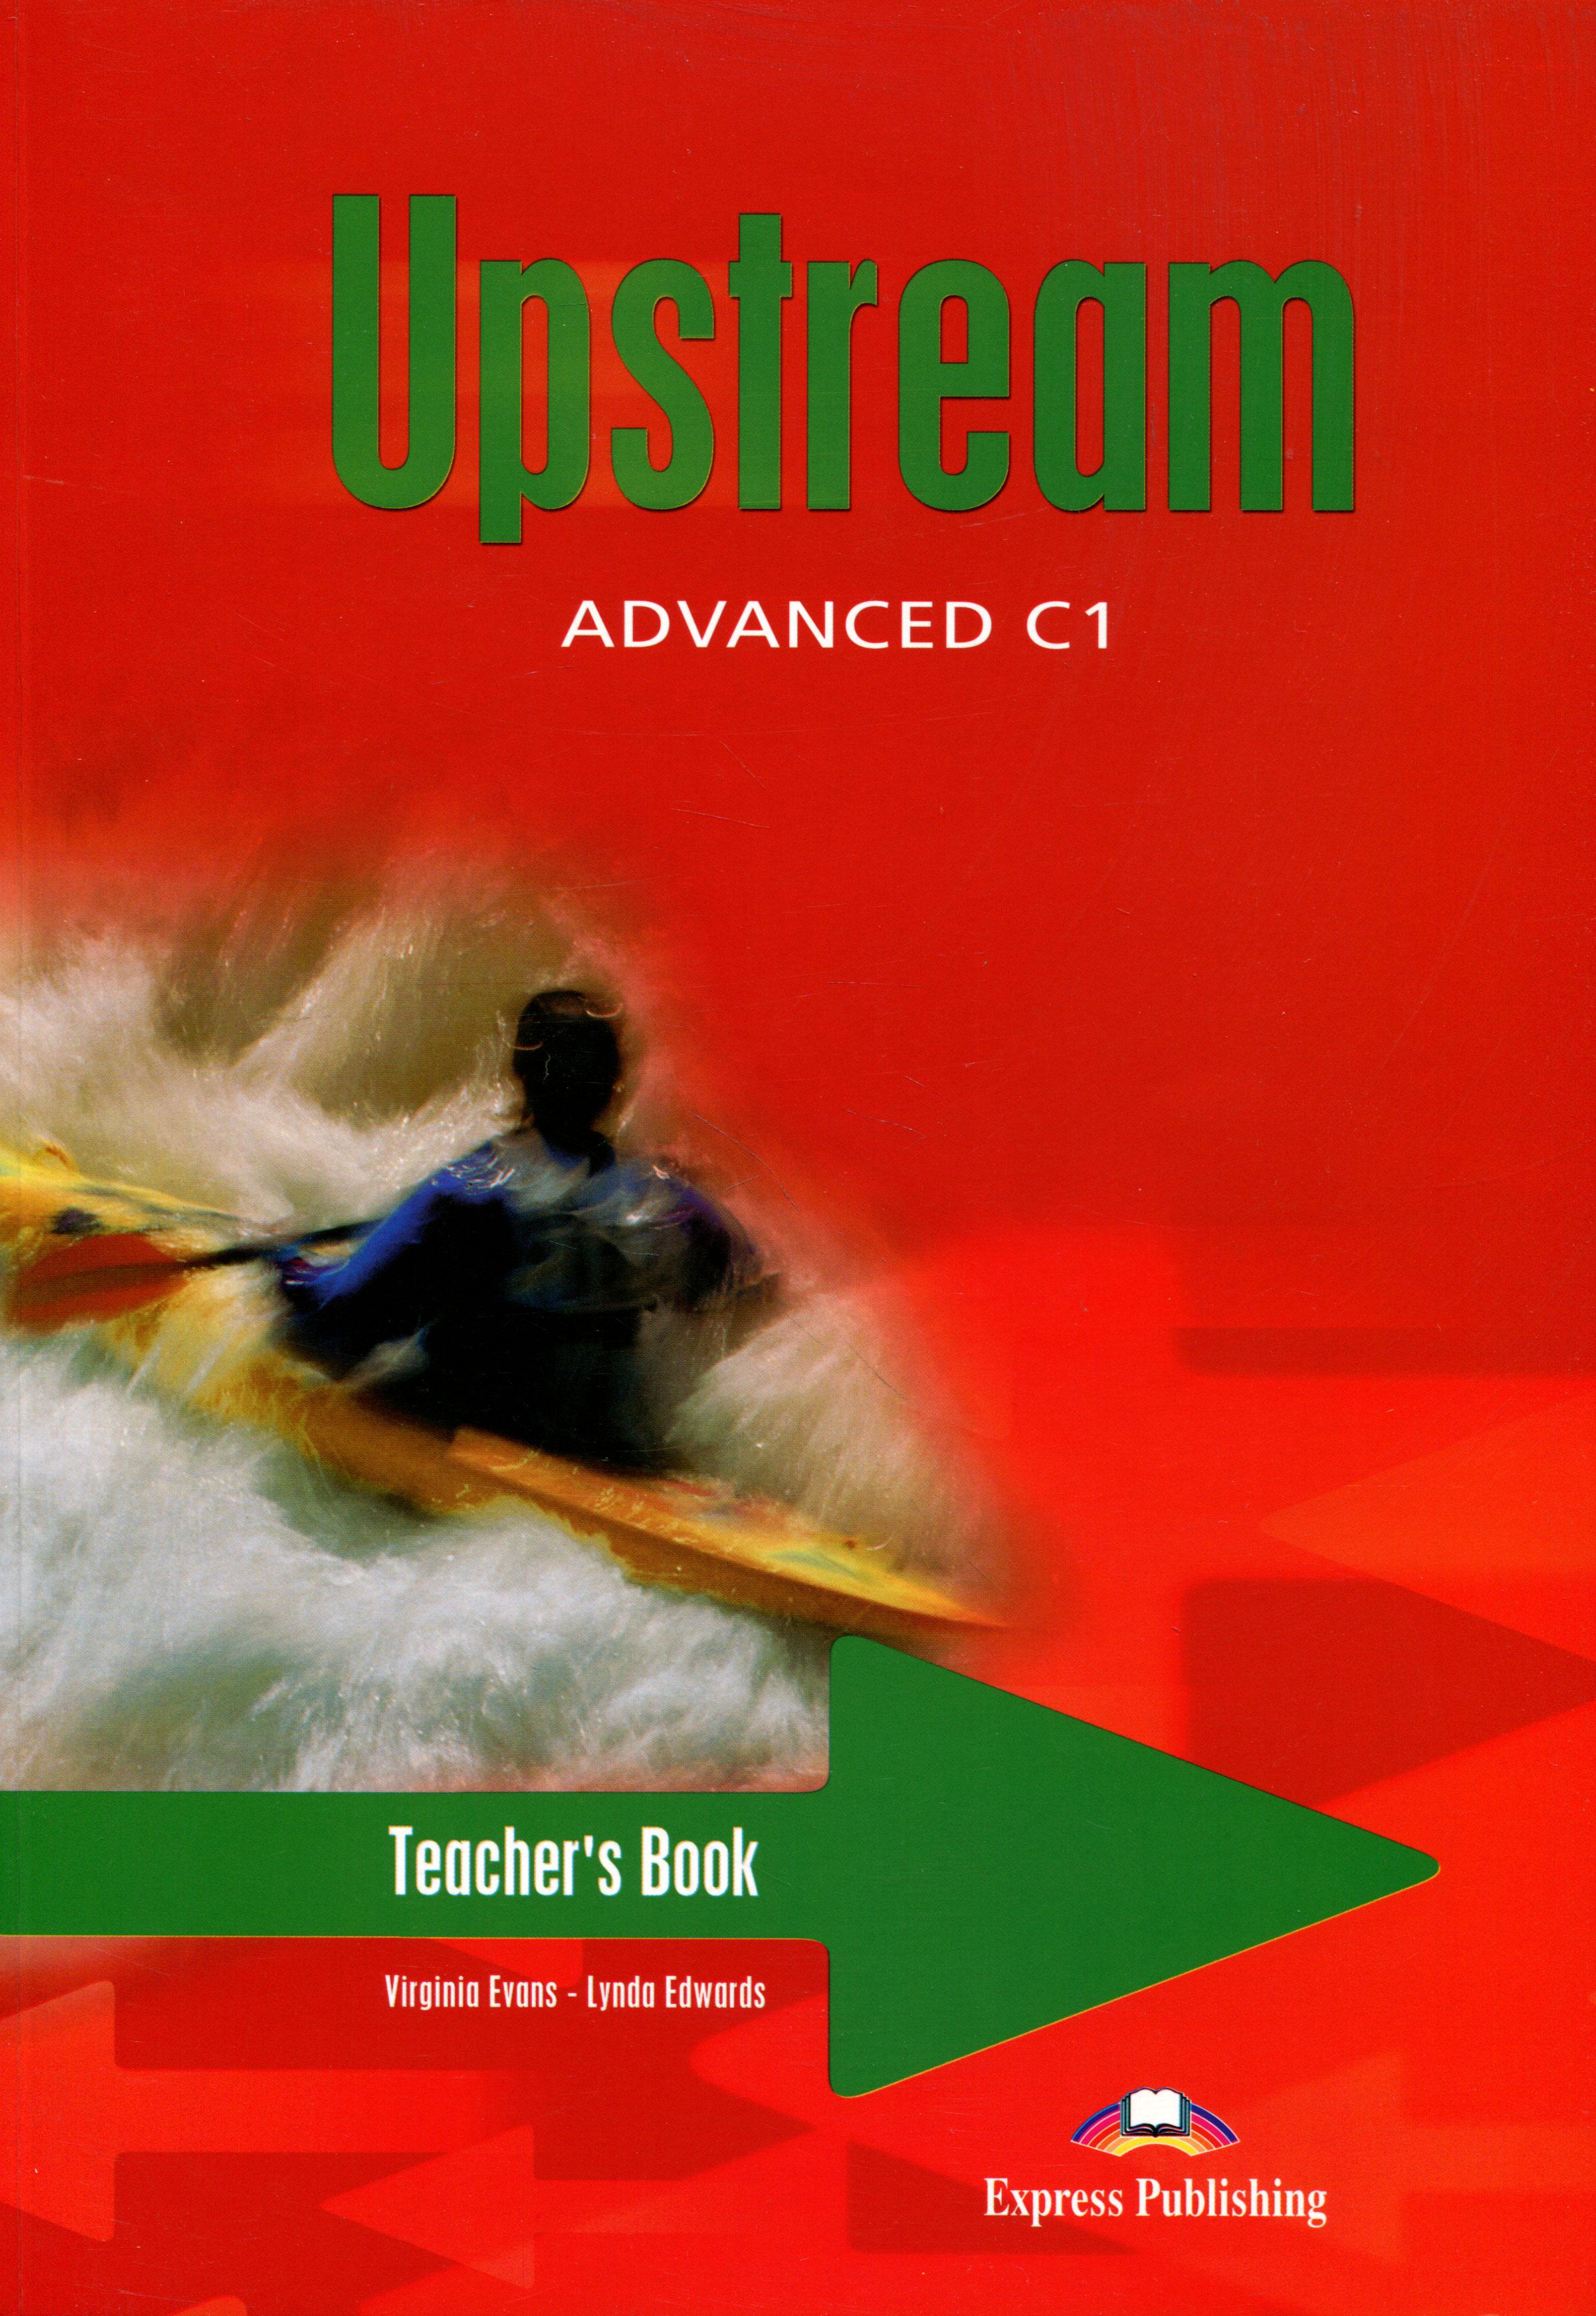 Upstream: Advanced C1: Teacher's Book